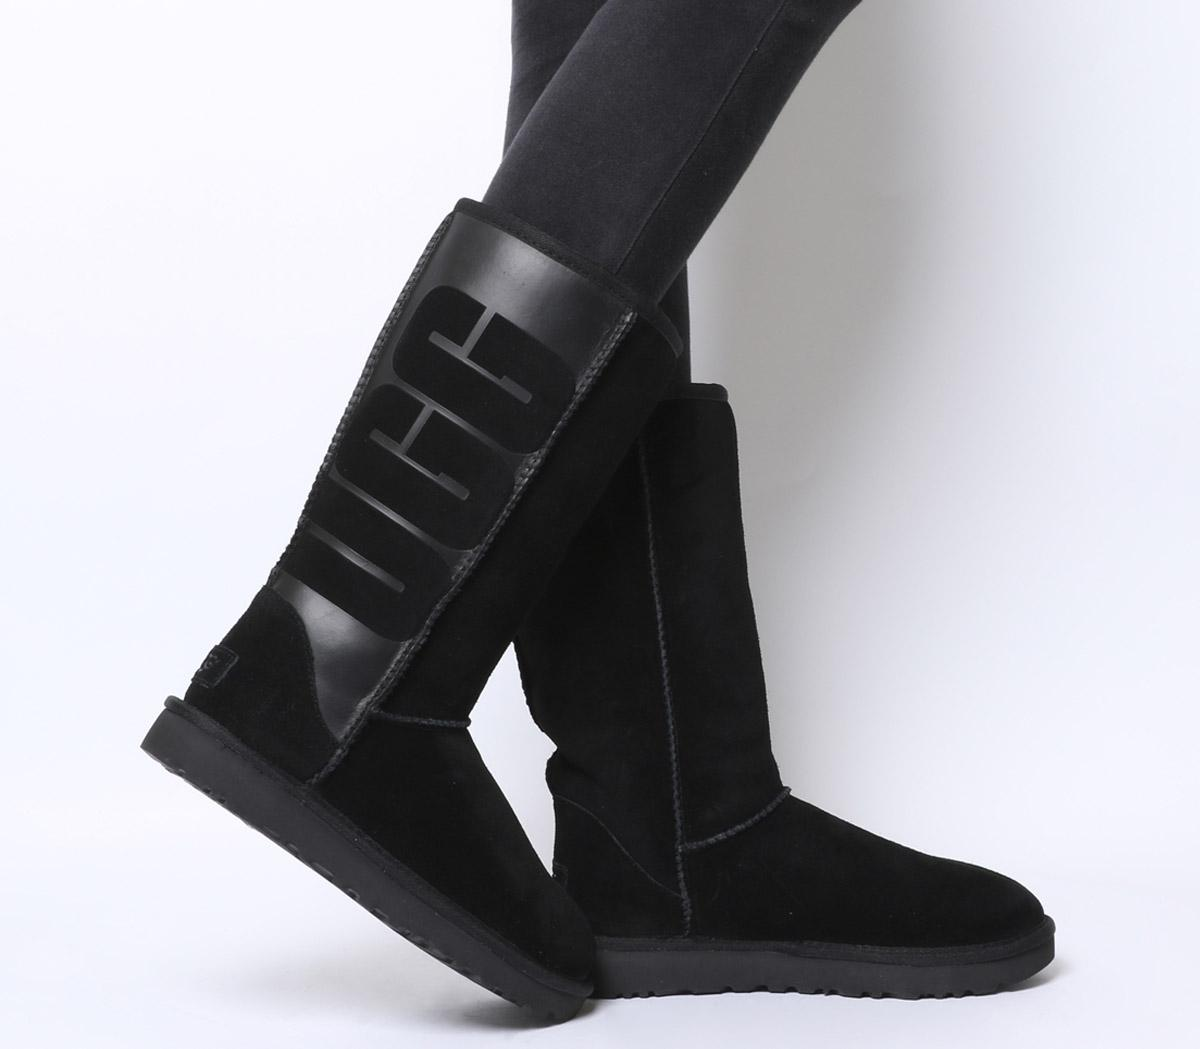 0b5c8e1fea1 Classic Tall Ugg Rubber Boots